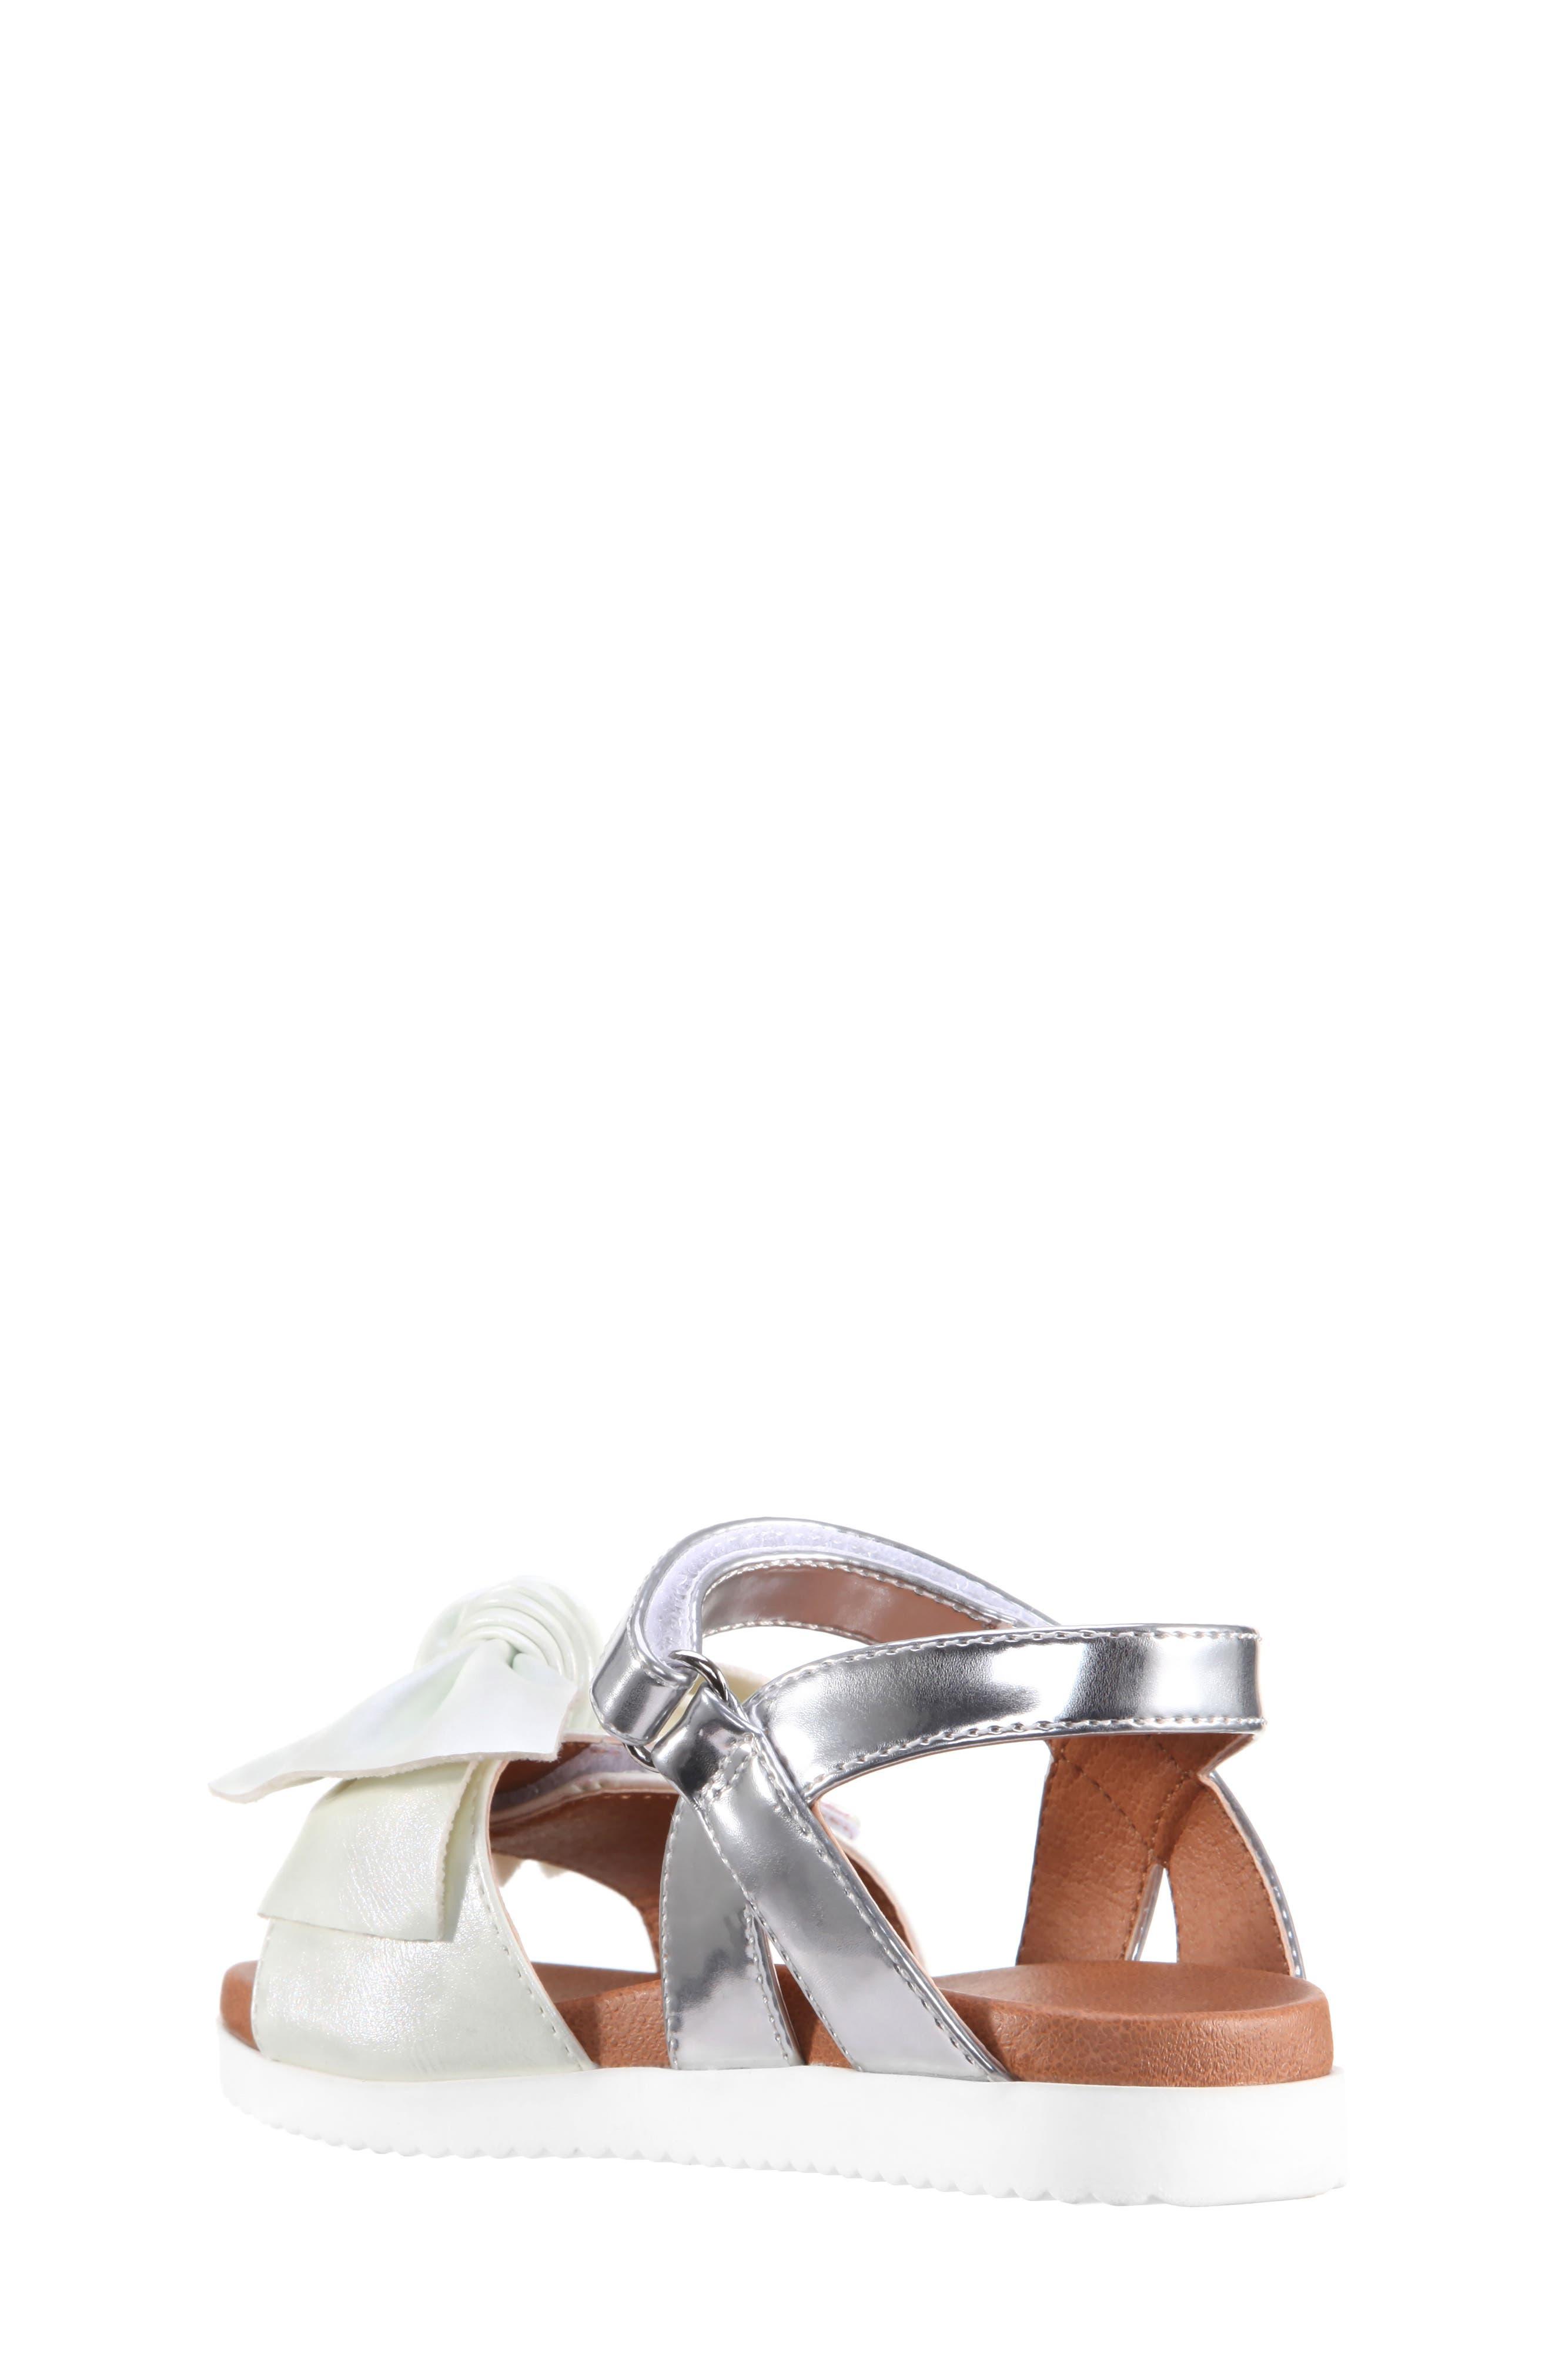 Kaitylyn Bow Sandal,                             Alternate thumbnail 2, color,                             White Metallic/ Silver